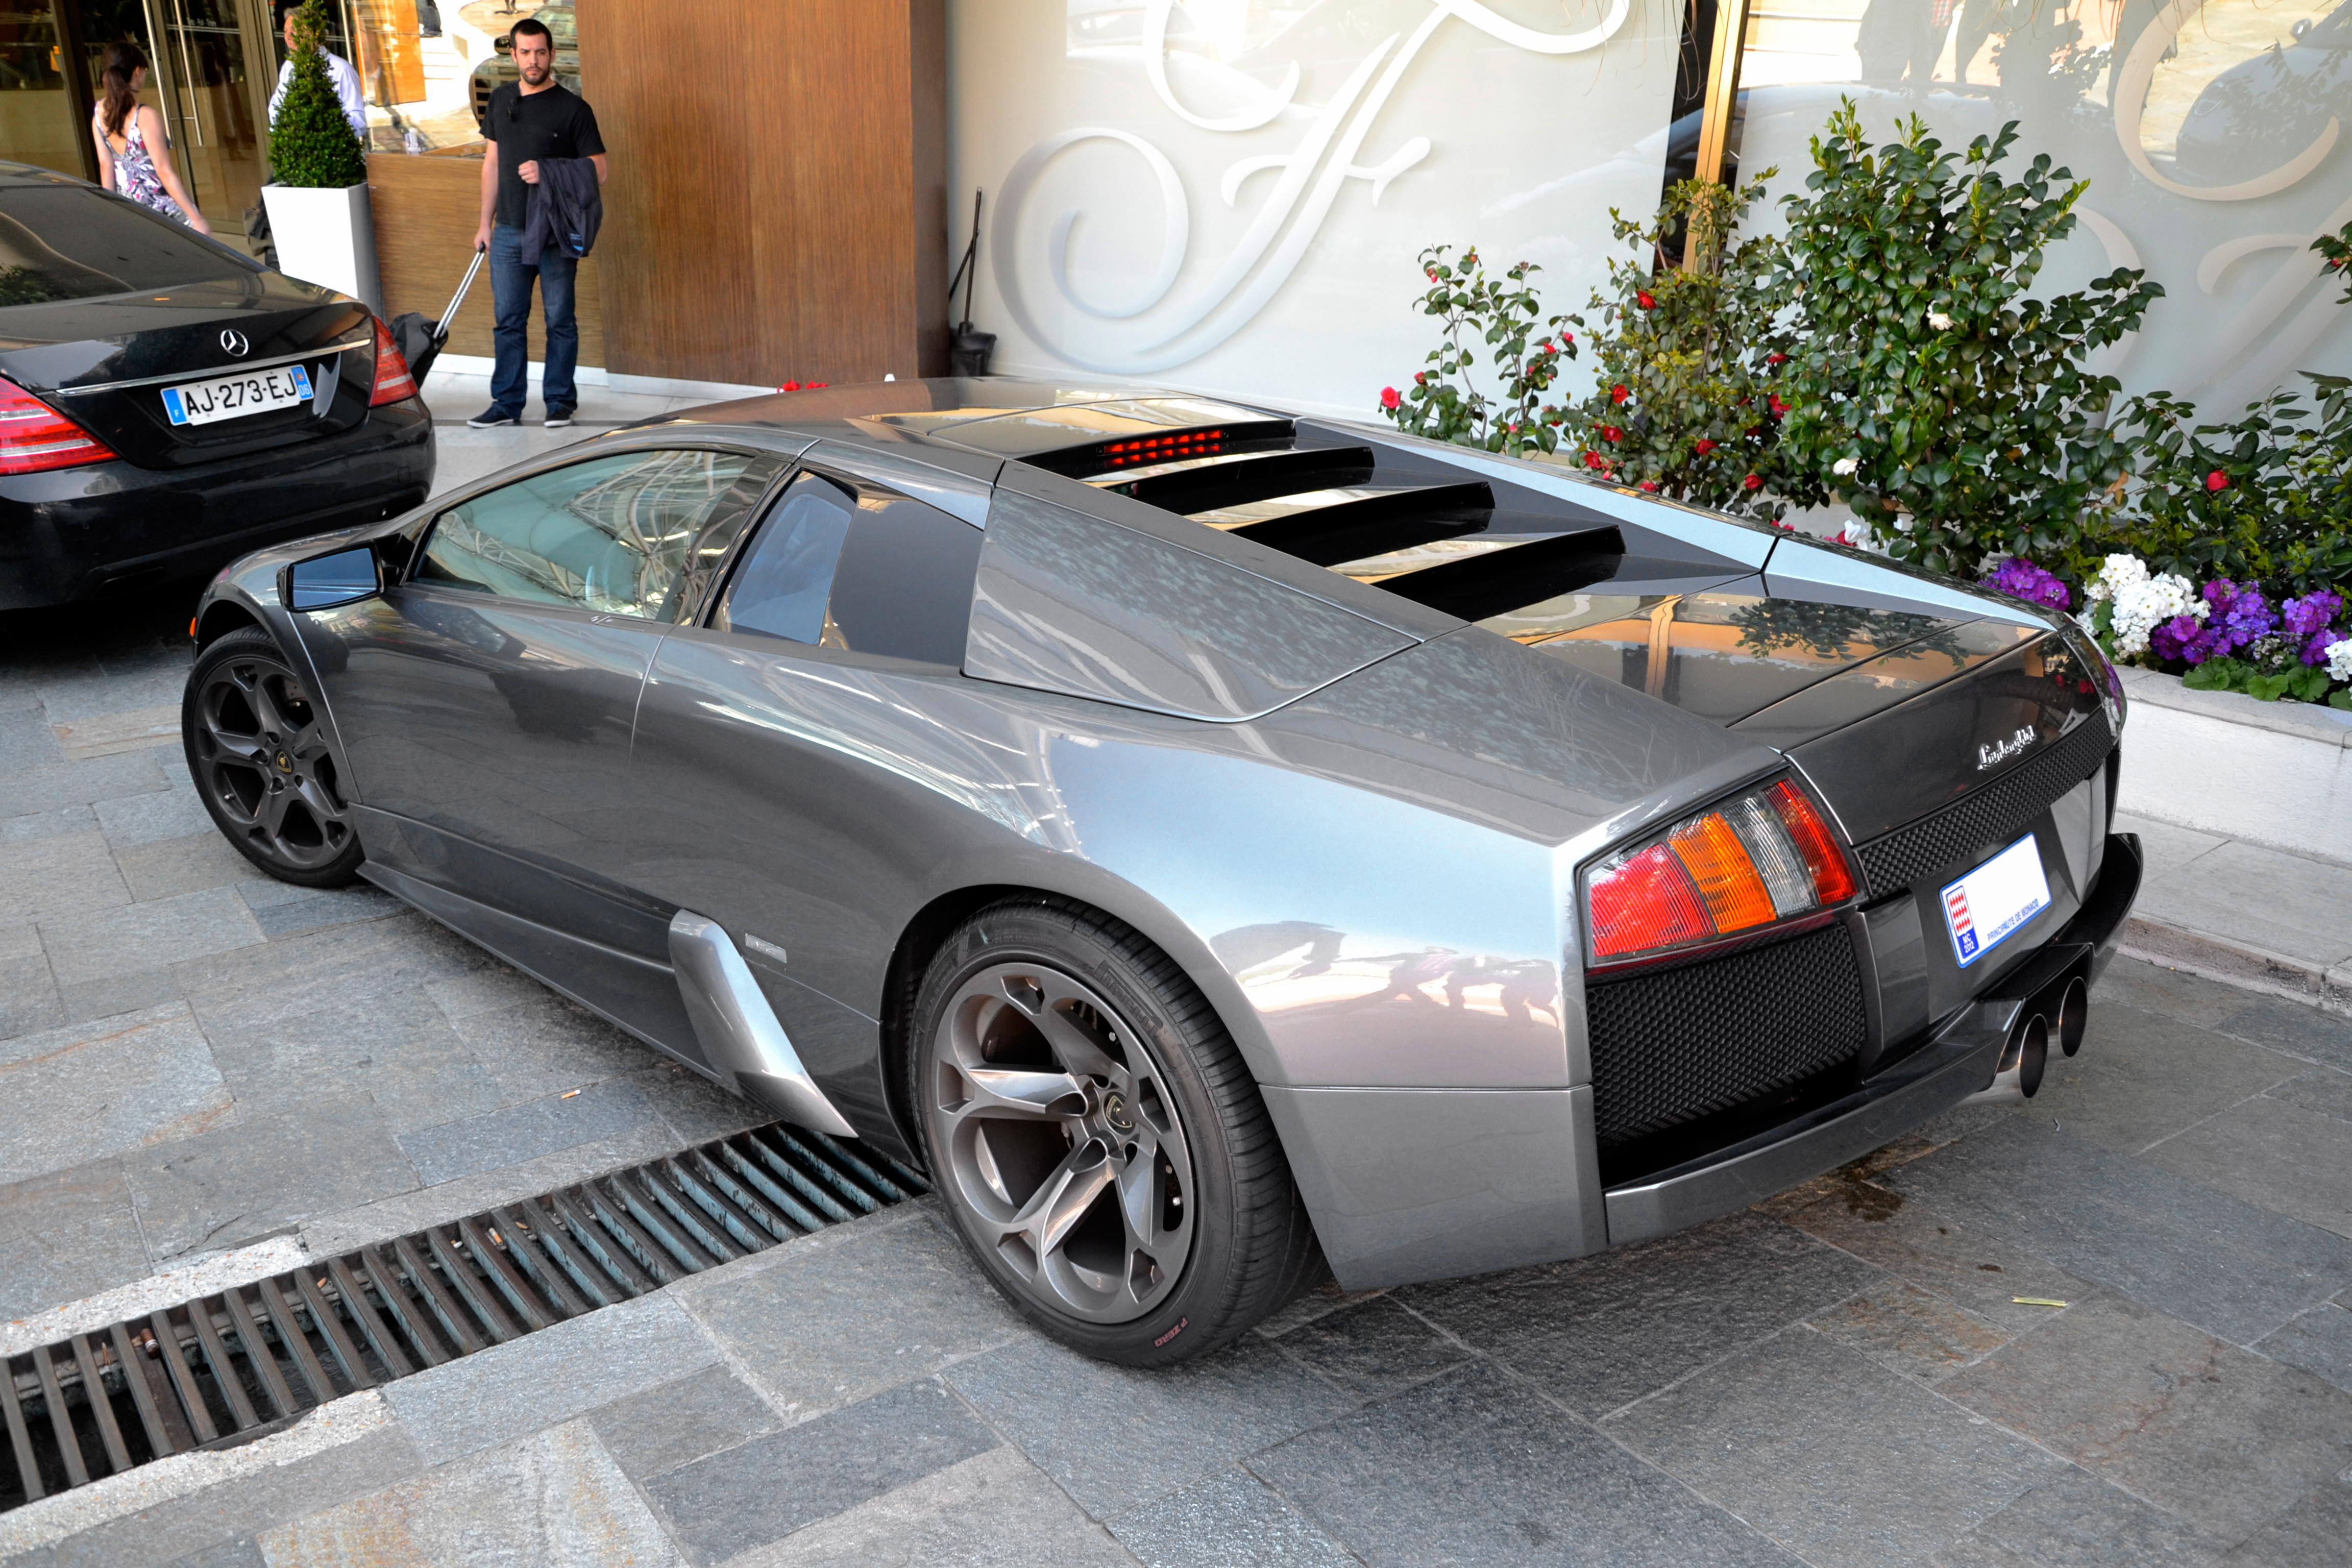 Lamborghini Murcielago 0 100 Id 233 E D Image De Voiture